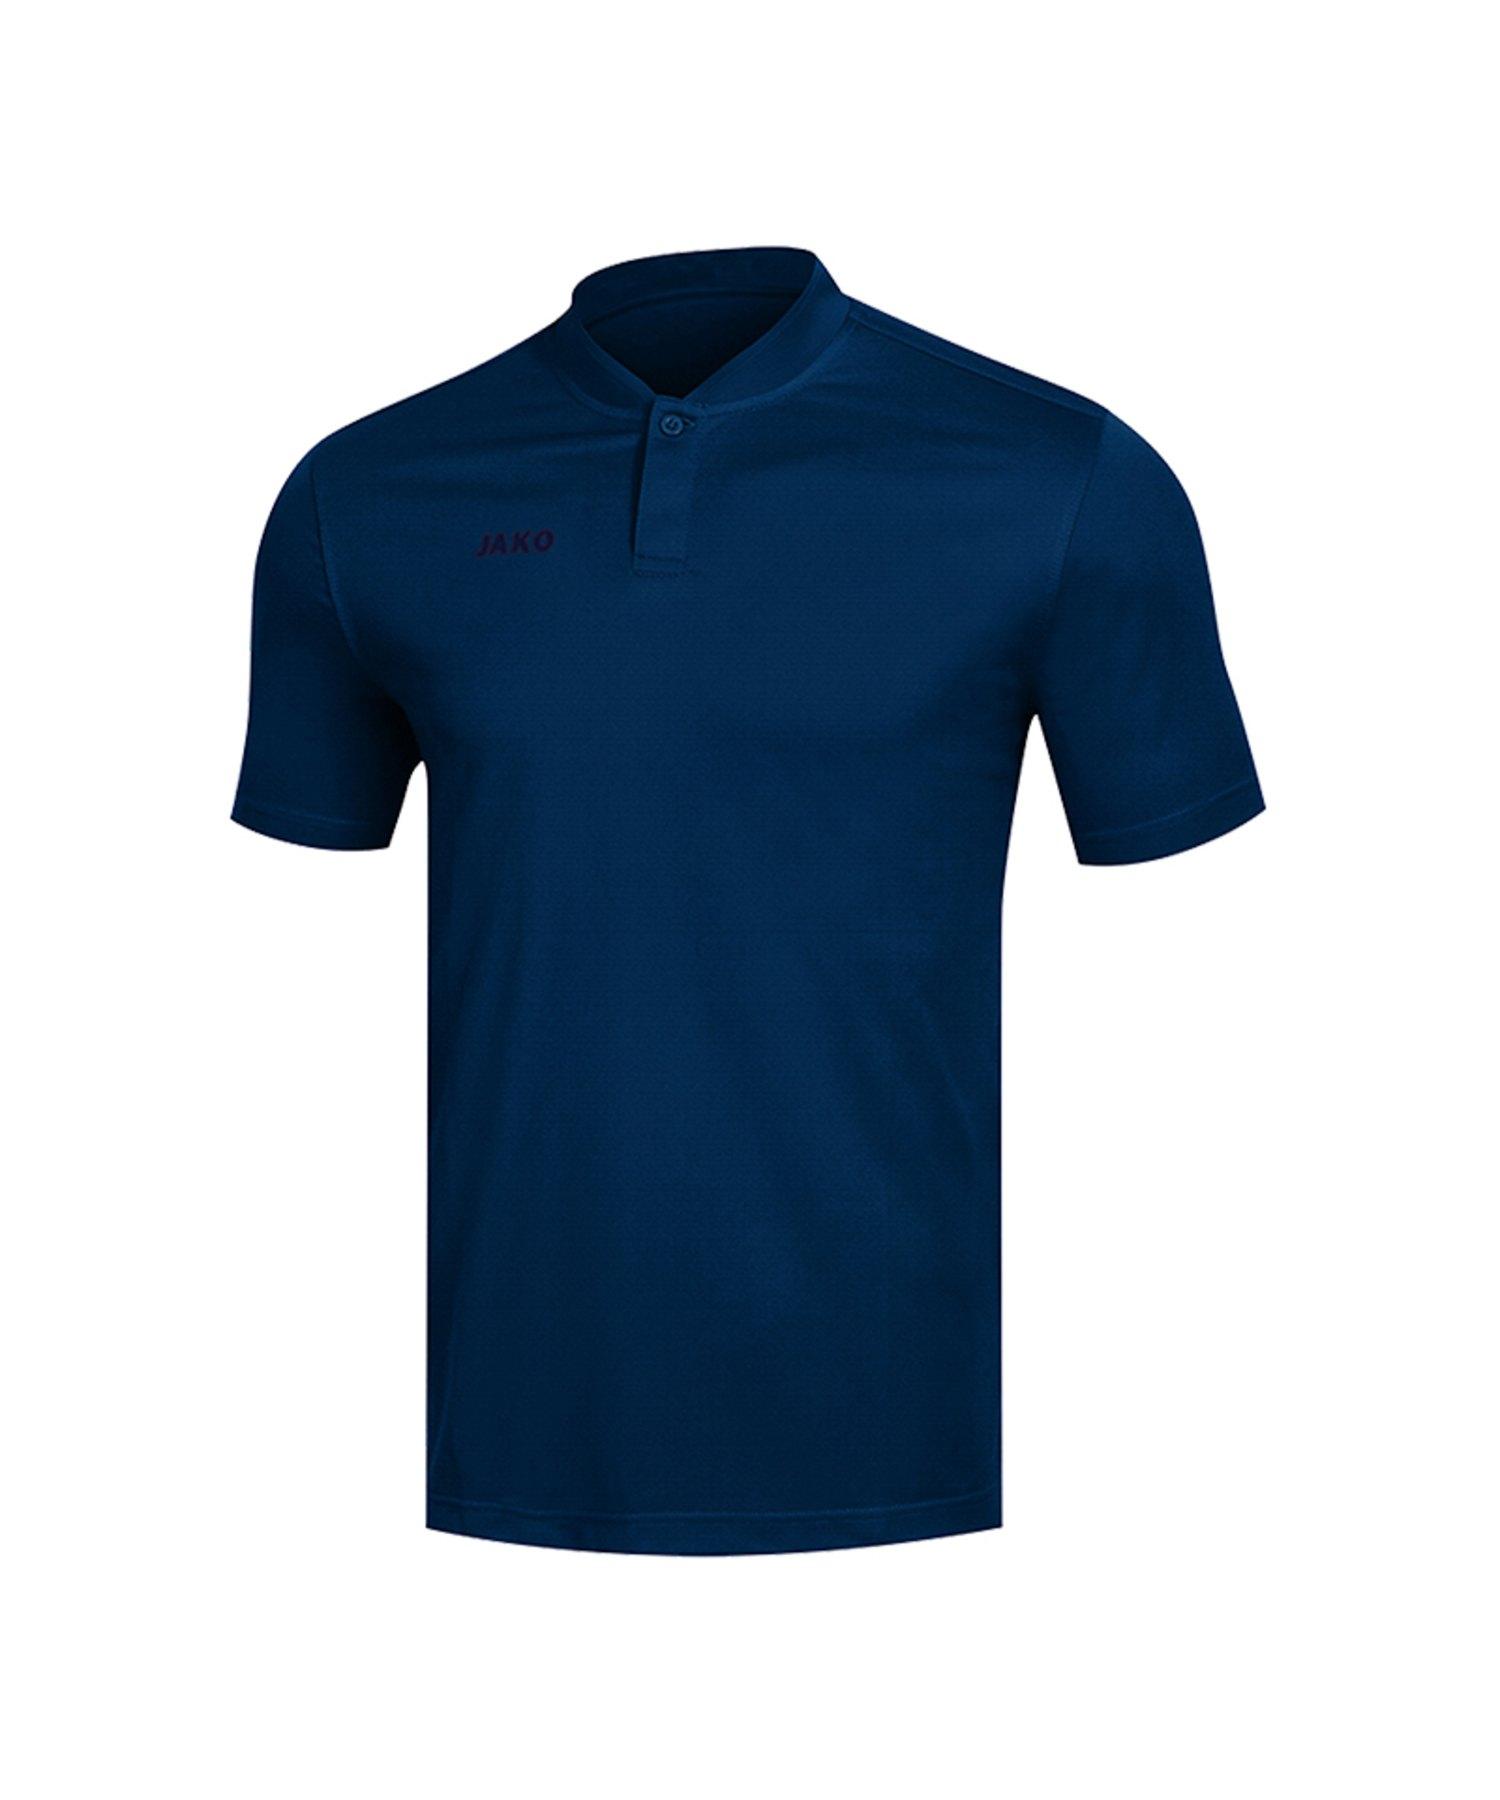 Jako Prestige Poloshirt Blau F49 - Blau